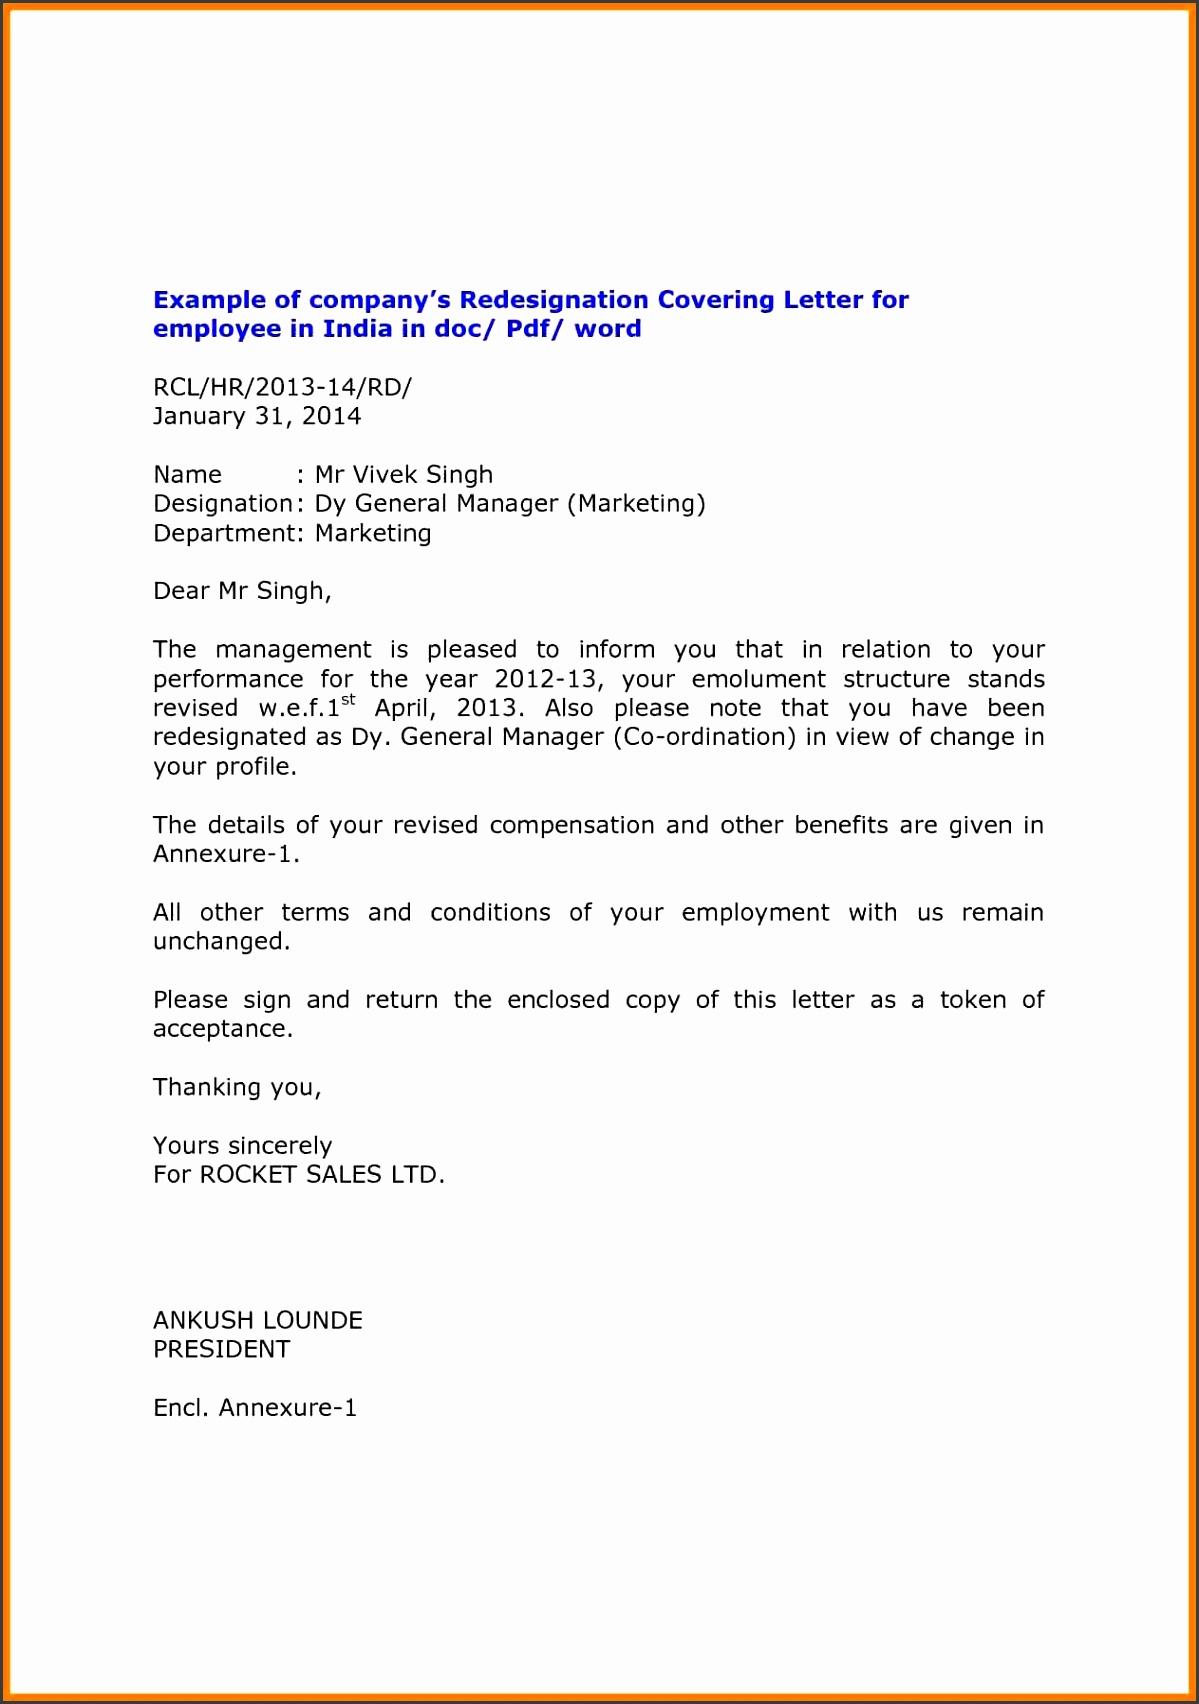 Model Resign Letter Resigning Letter Format Doc How To Format A Resignation Letter Template